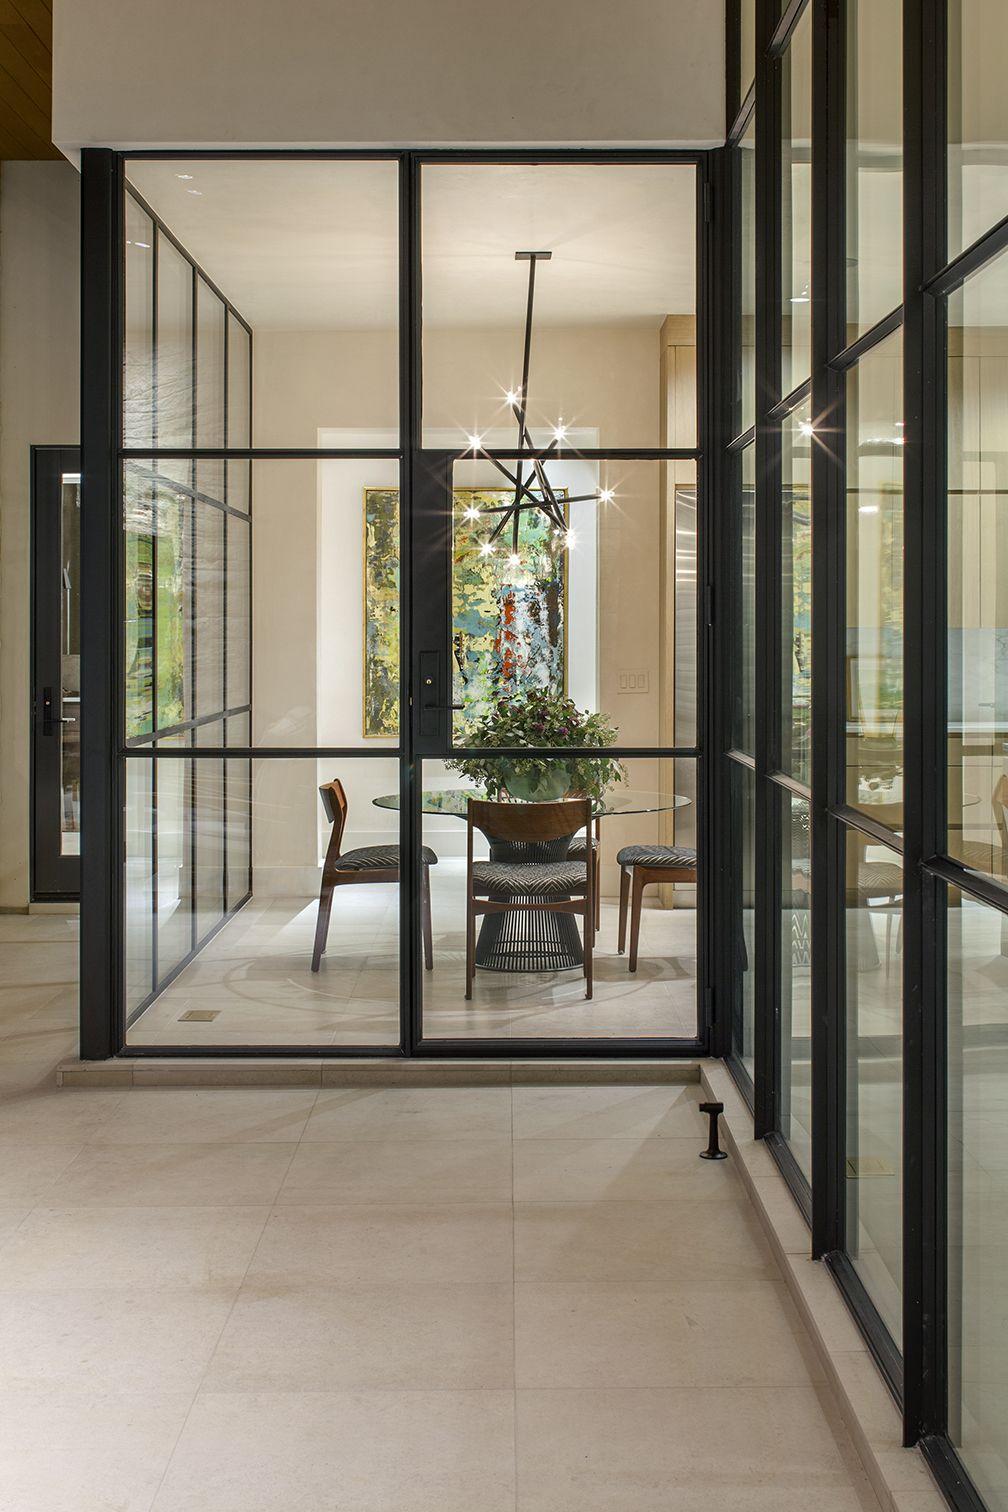 Rehmesteel Com Gallery Single Doors Aspx 613 2019